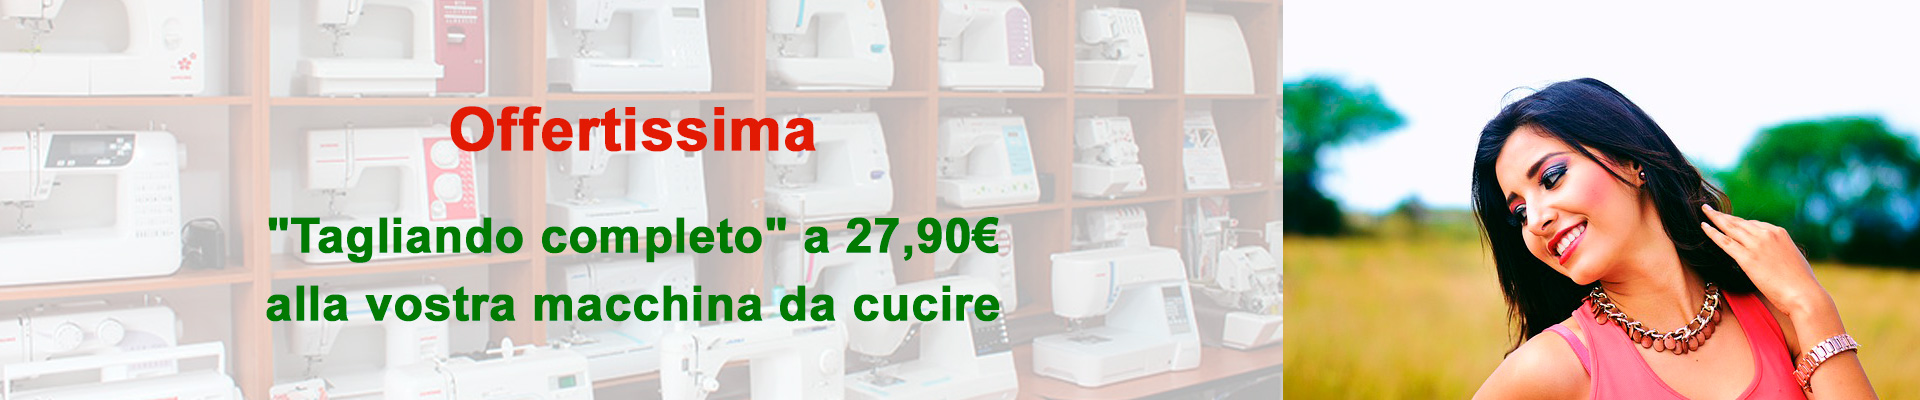 offertissima1